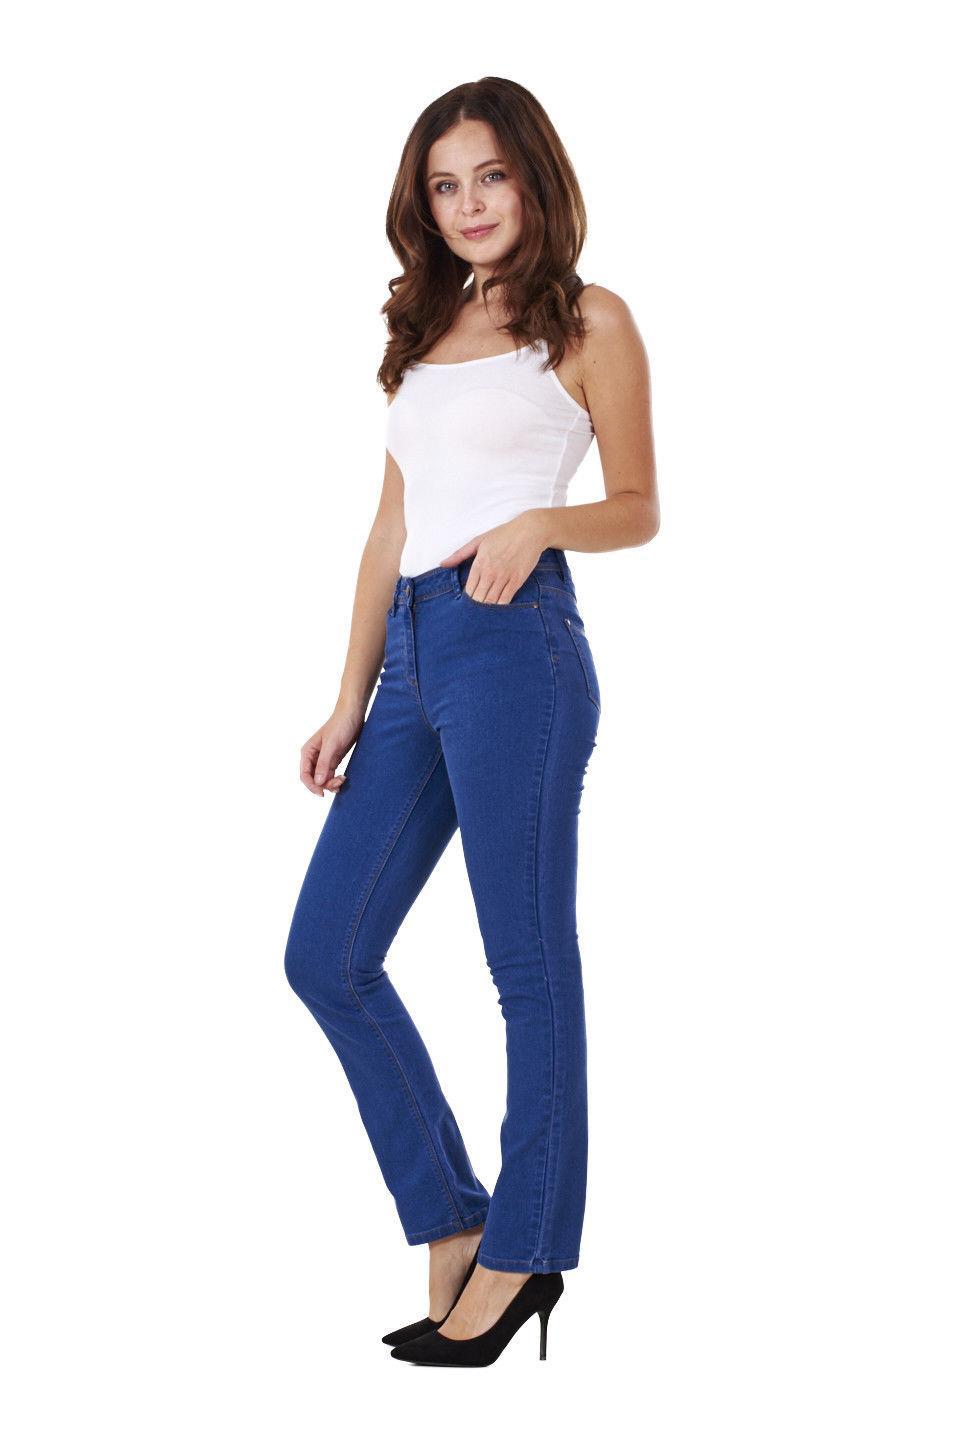 Ladies-Straight-Leg-Denim-Womens-Pants-Stretch-Regular-Fit-Jeans thumbnail 14